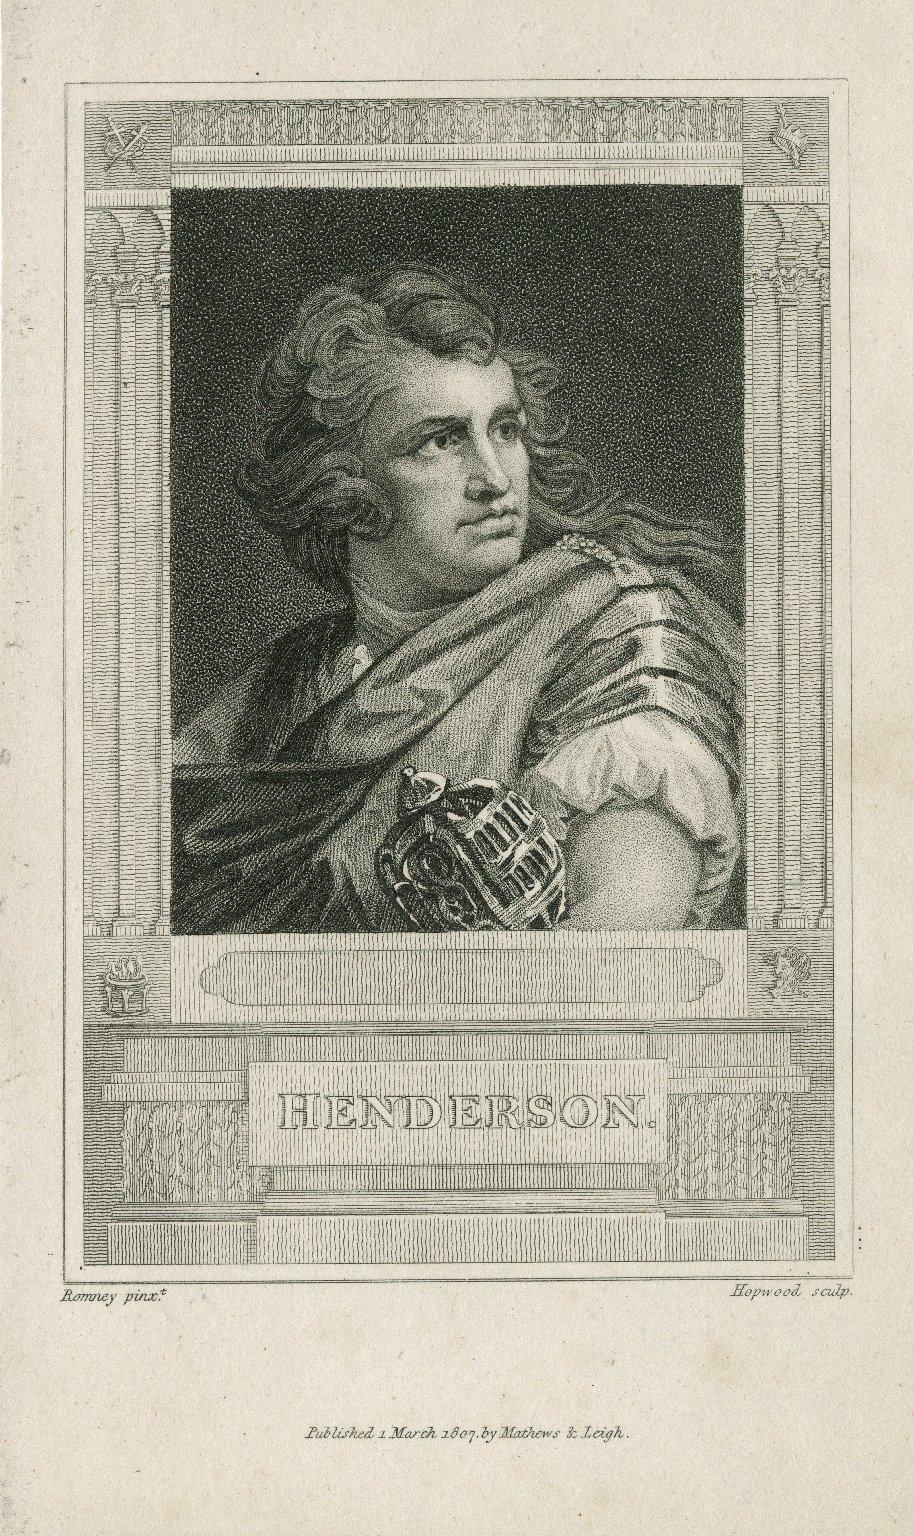 Henderson [graphic] / Romney, pinxt. ; Hopwood, sculpt.